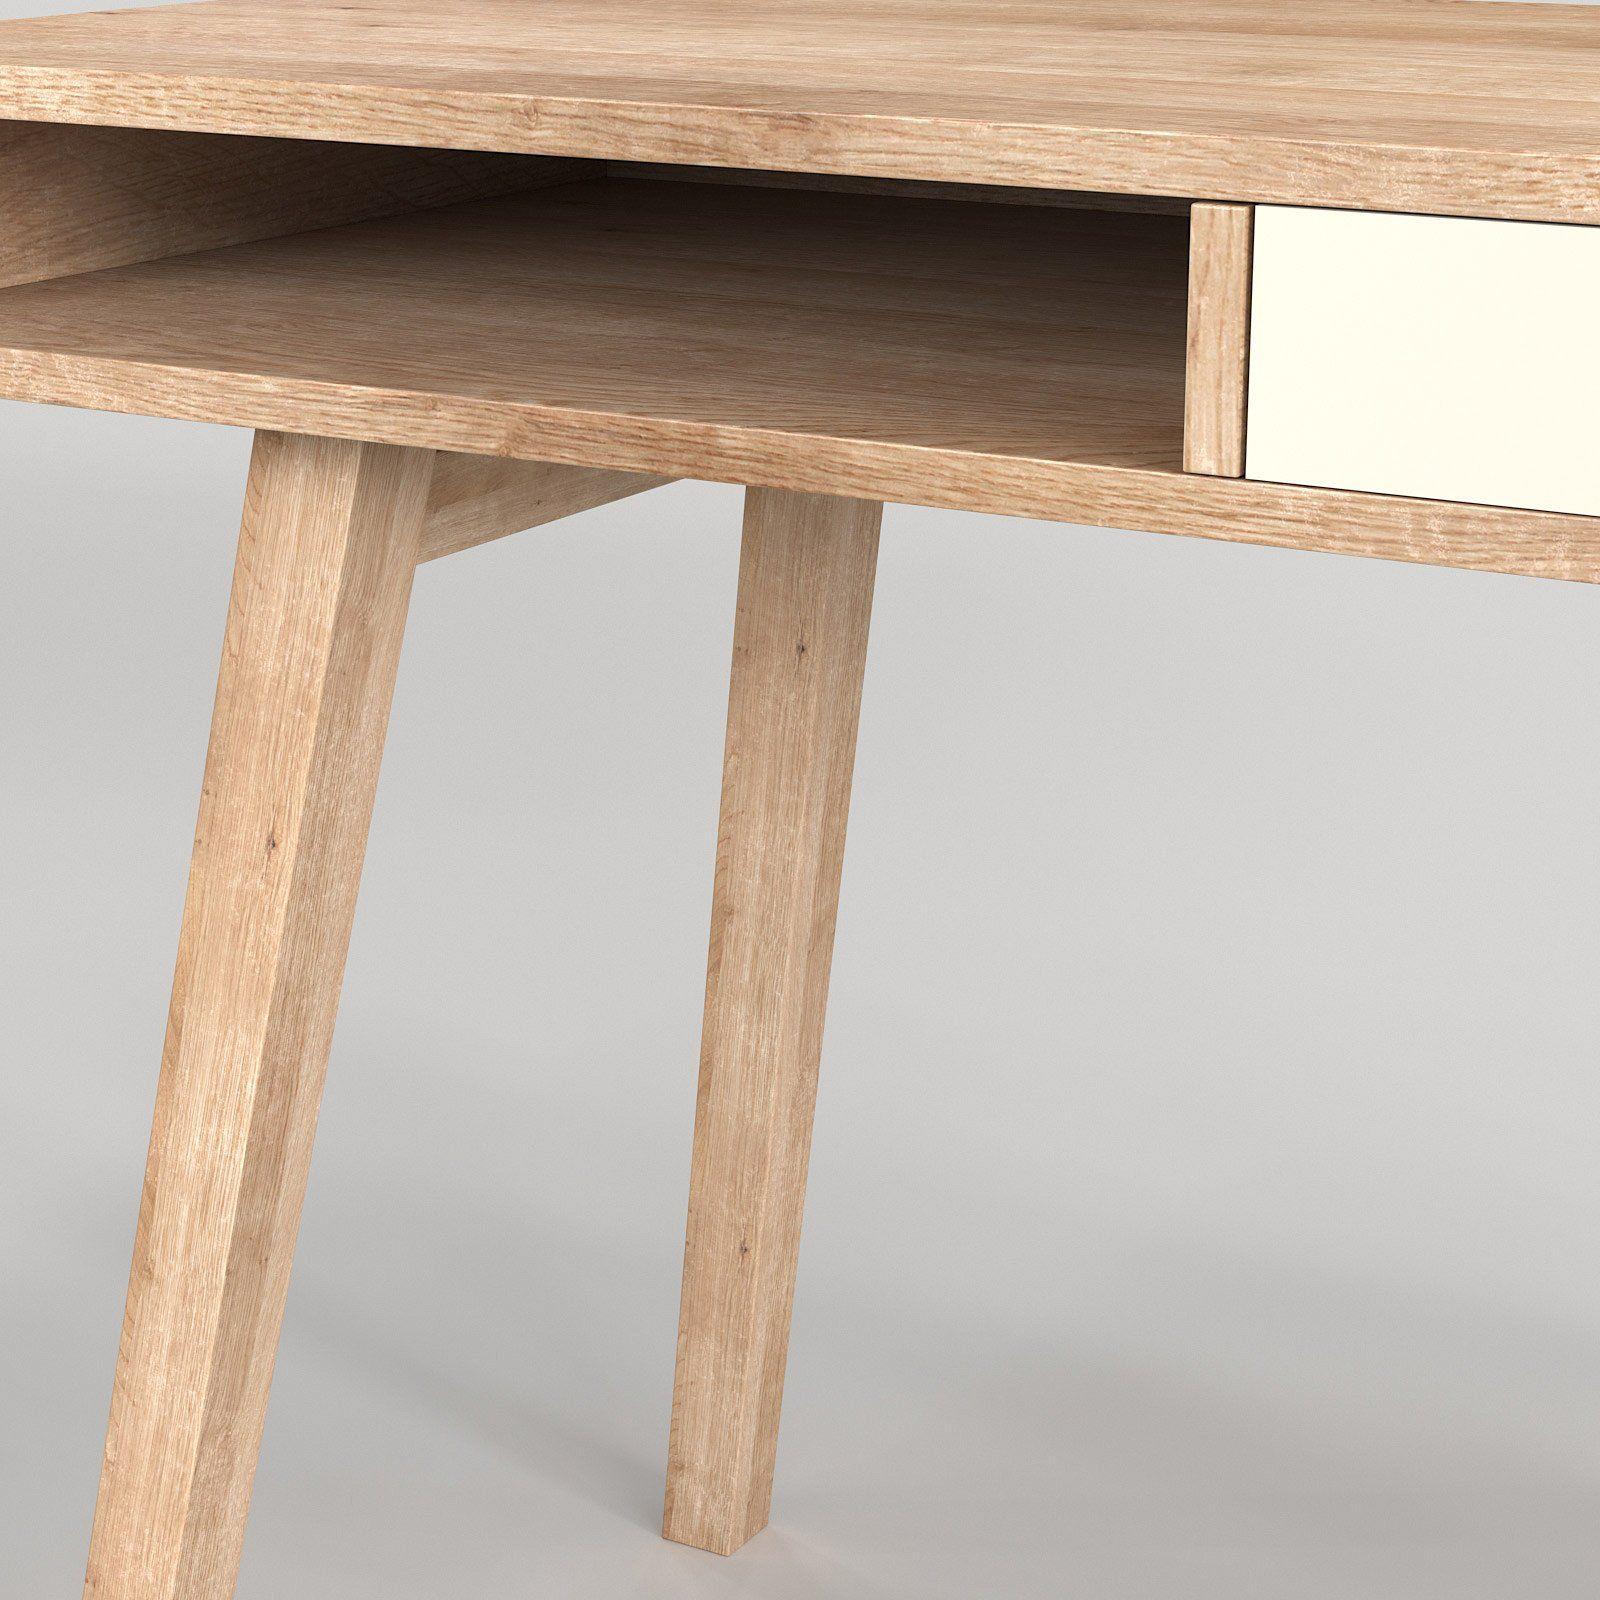 Scandinavian Desk 01 Scandinavian Desk Scandinavian Desk